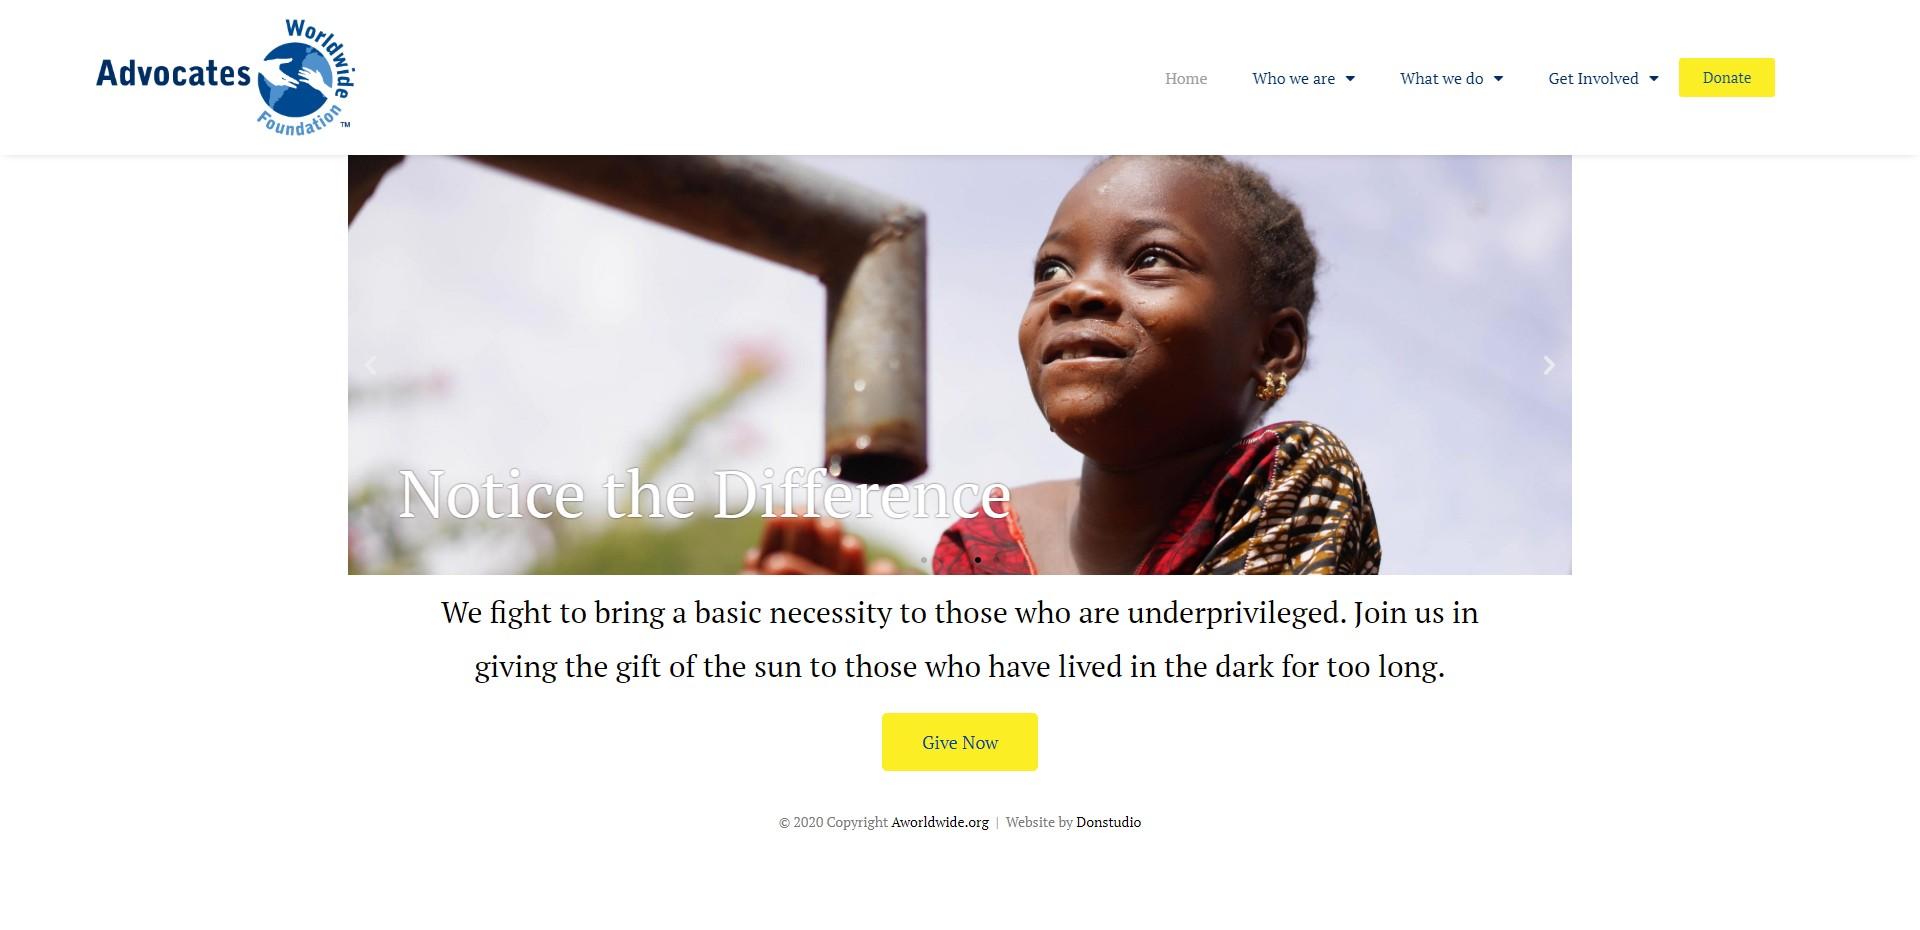 Africa non profit organization advocateww.org